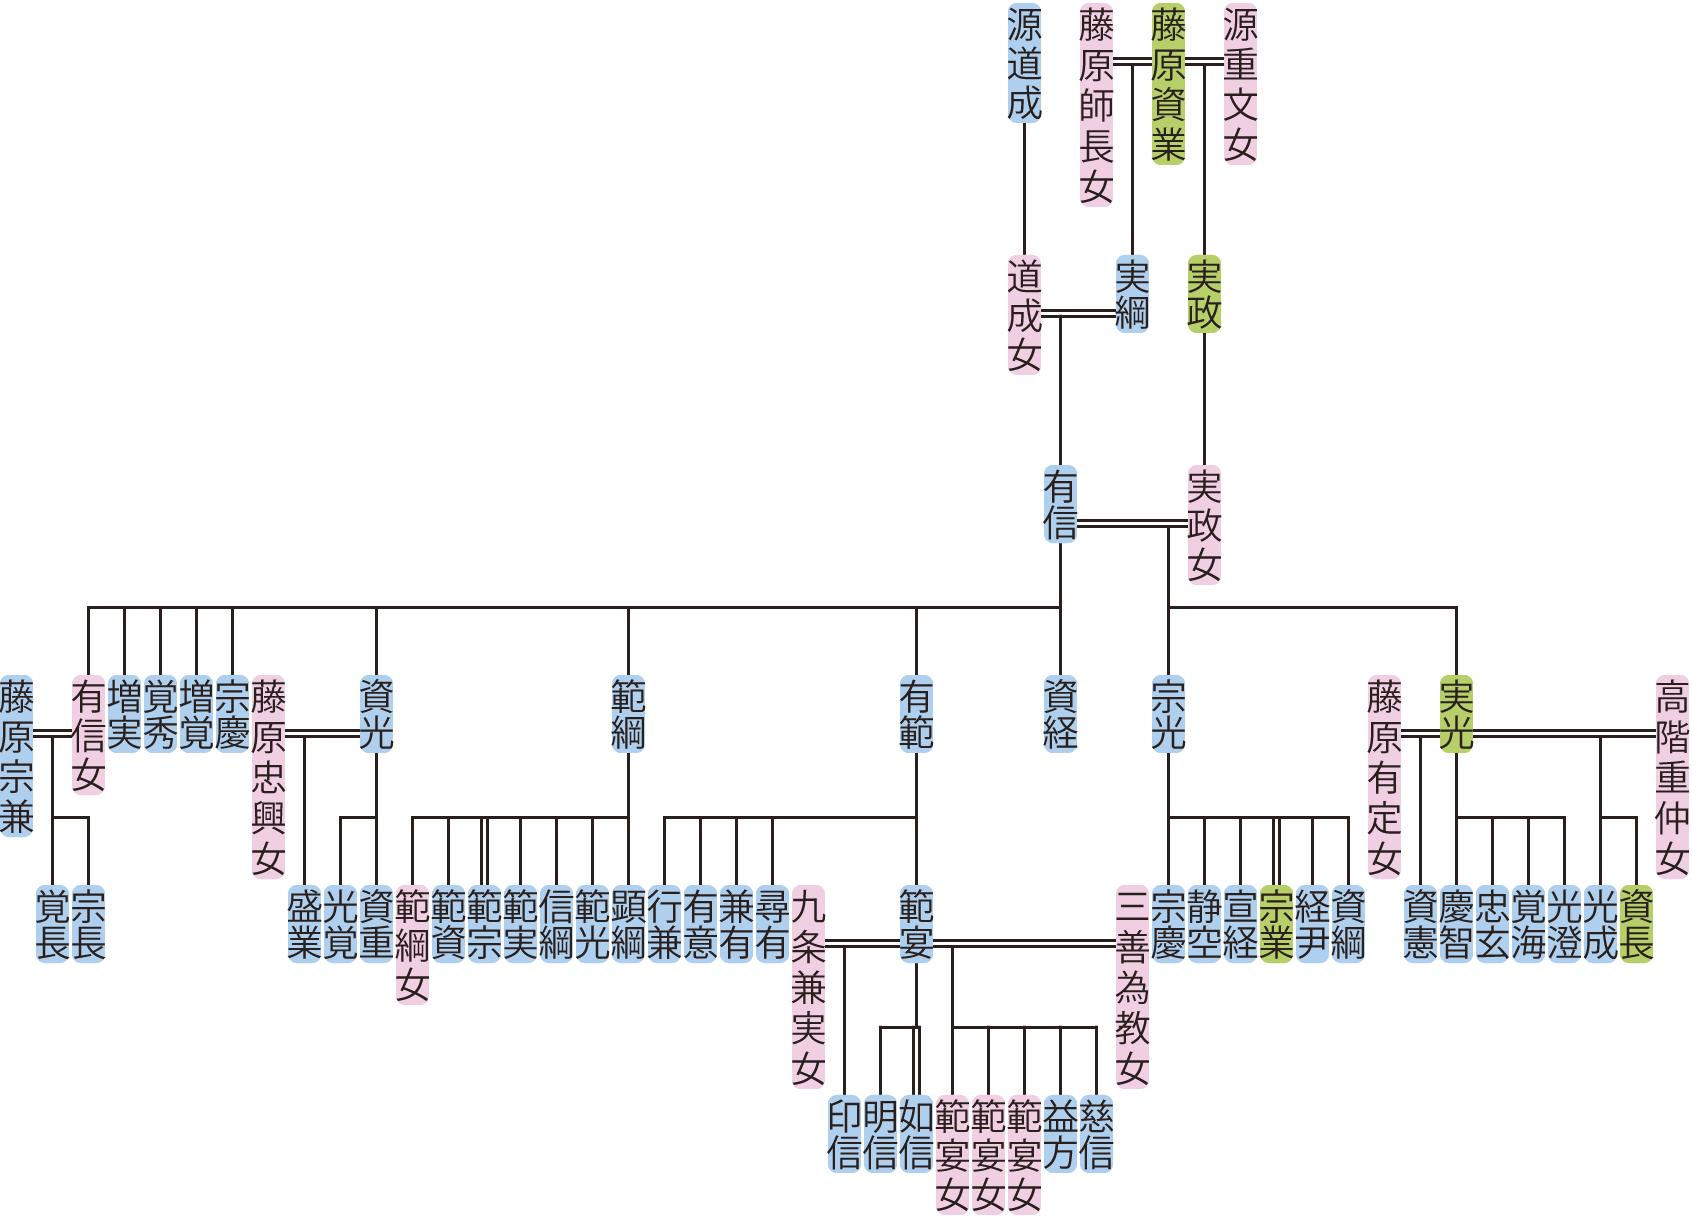 藤原有信の系図